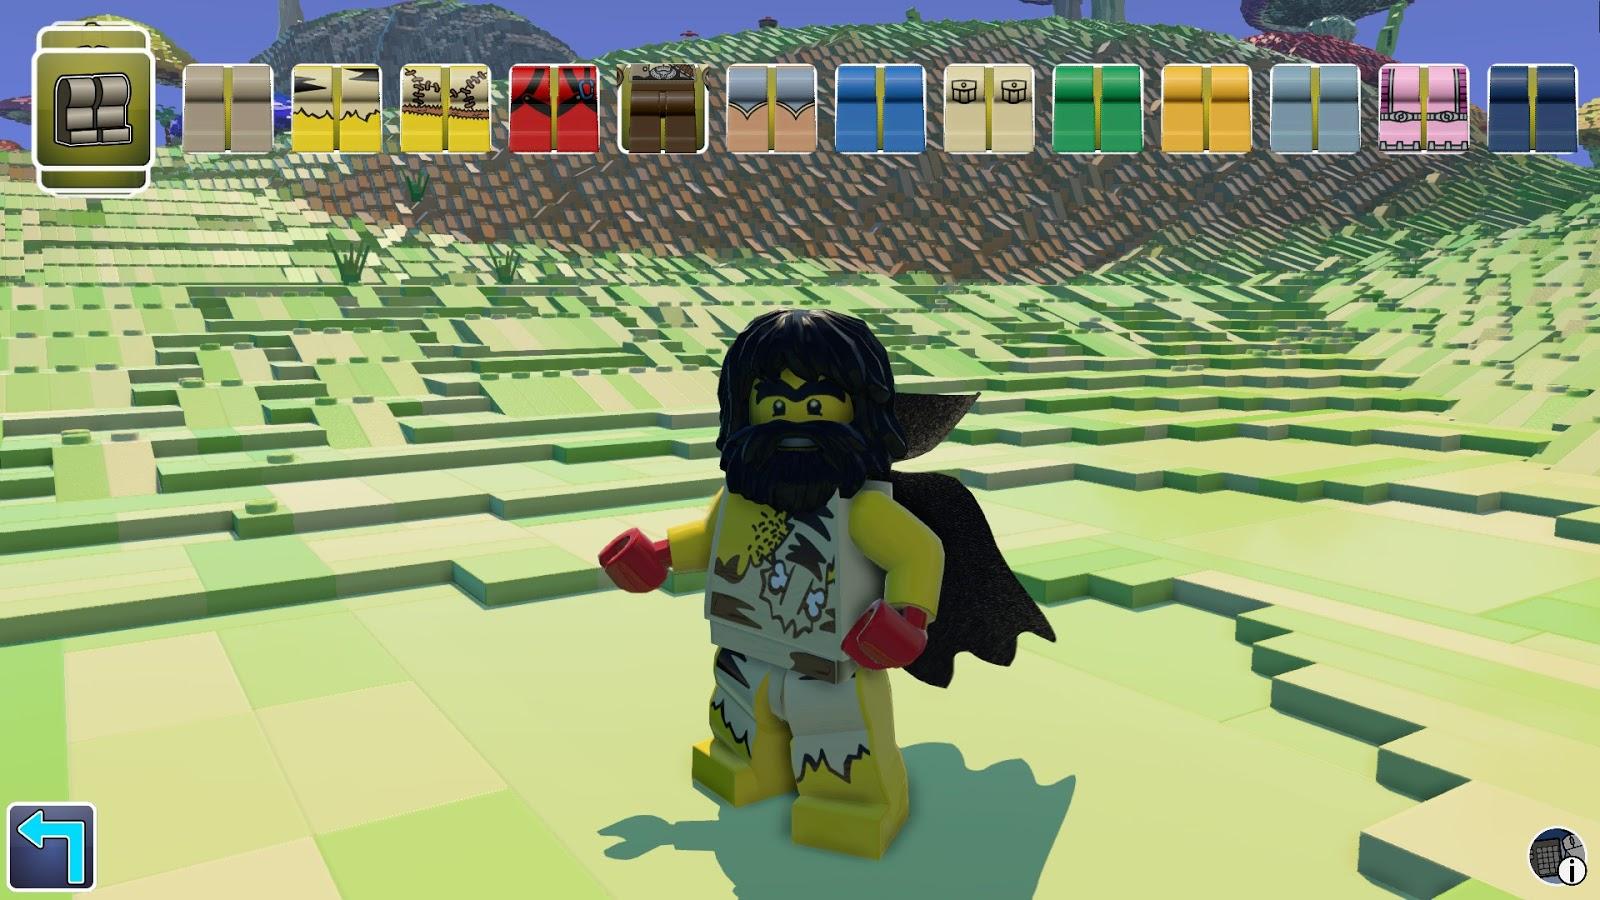 Descargar Lego Worlds Pc Full 1 Link Iso Espanol Gratis